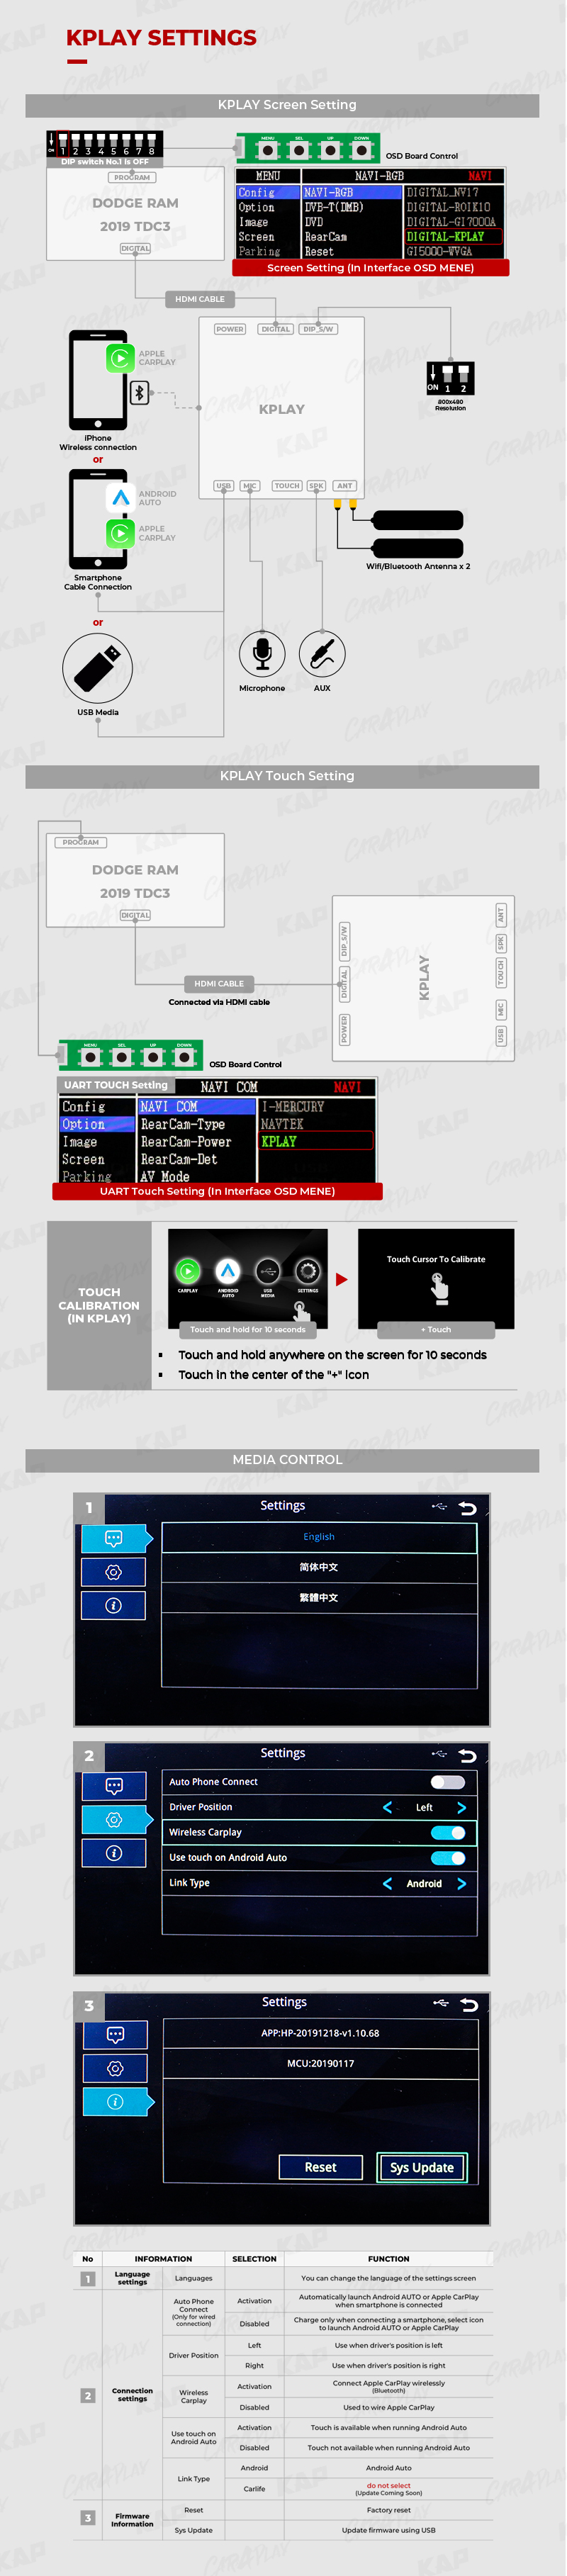 DODGE-RAM-2019-TDC3_DETAIL_16.jpg